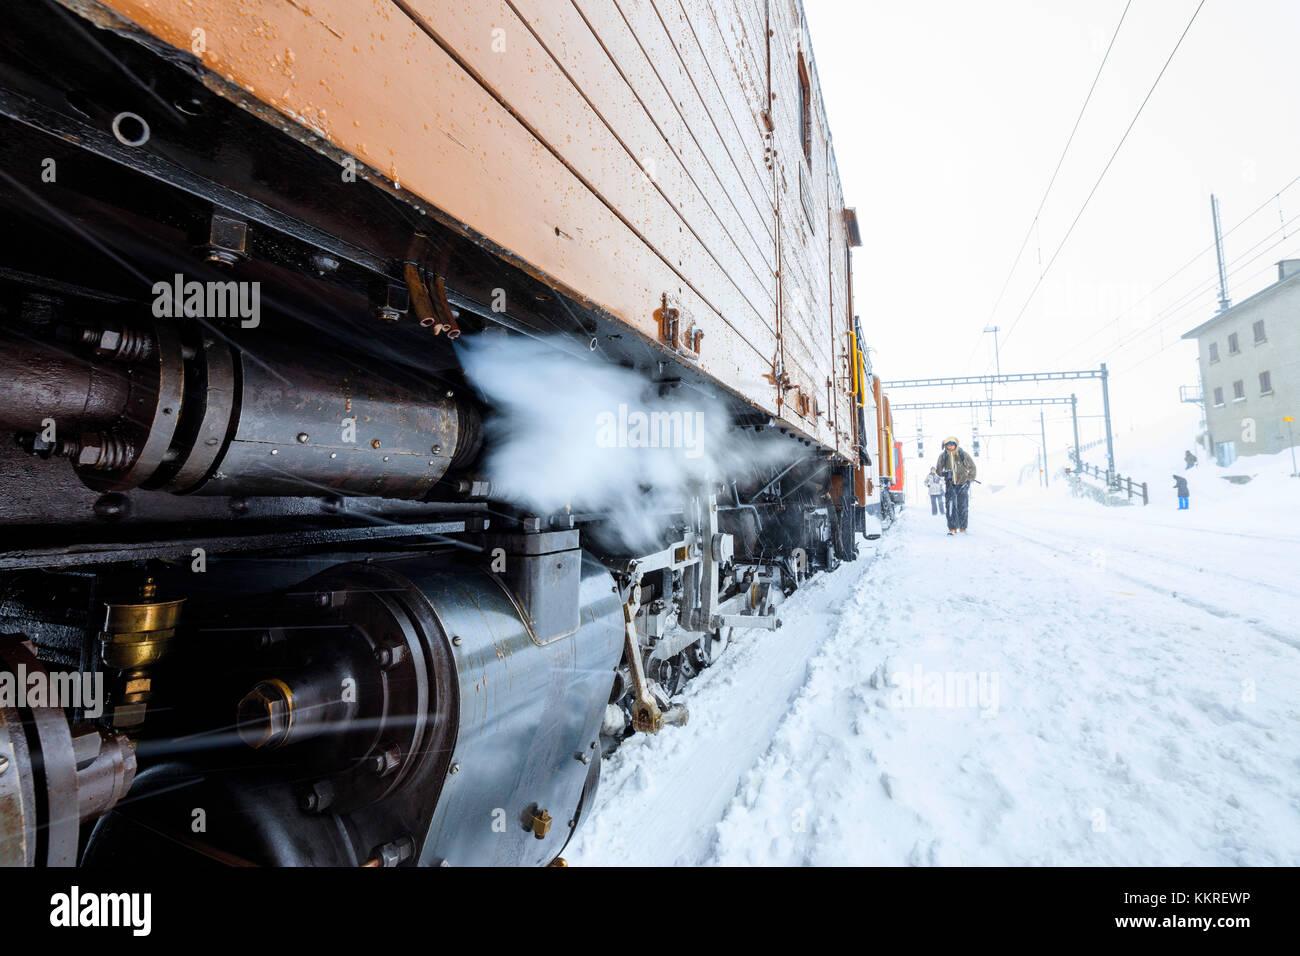 Details of the snowplow of Bernina Express train, Ospizio Bernina, Poschiavo, canton of Graubünden, Engadin, - Stock Image